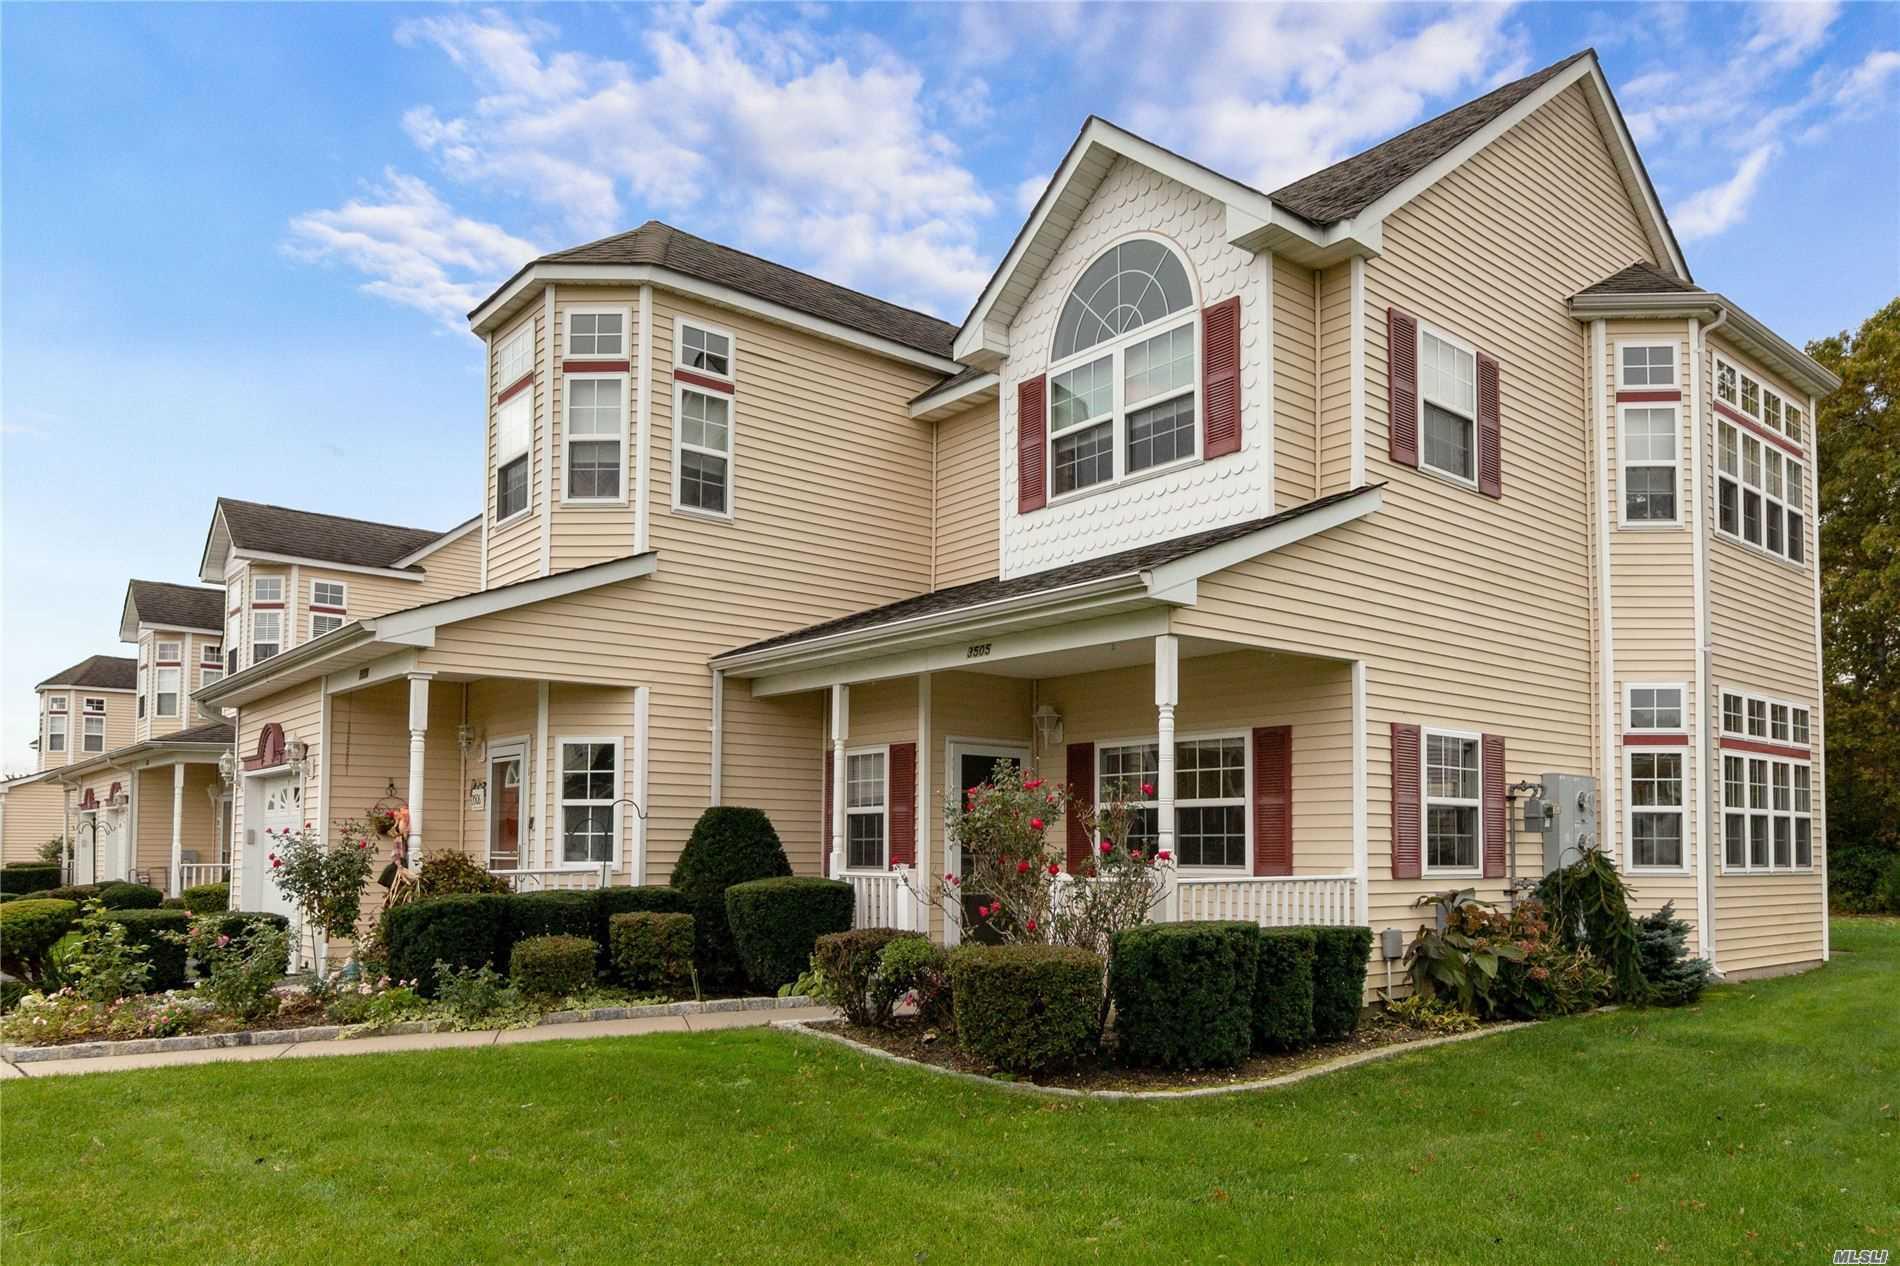 Property for sale at 3505 Amen Corners, Riverhead NY 11901, Riverhead,  New York 11901